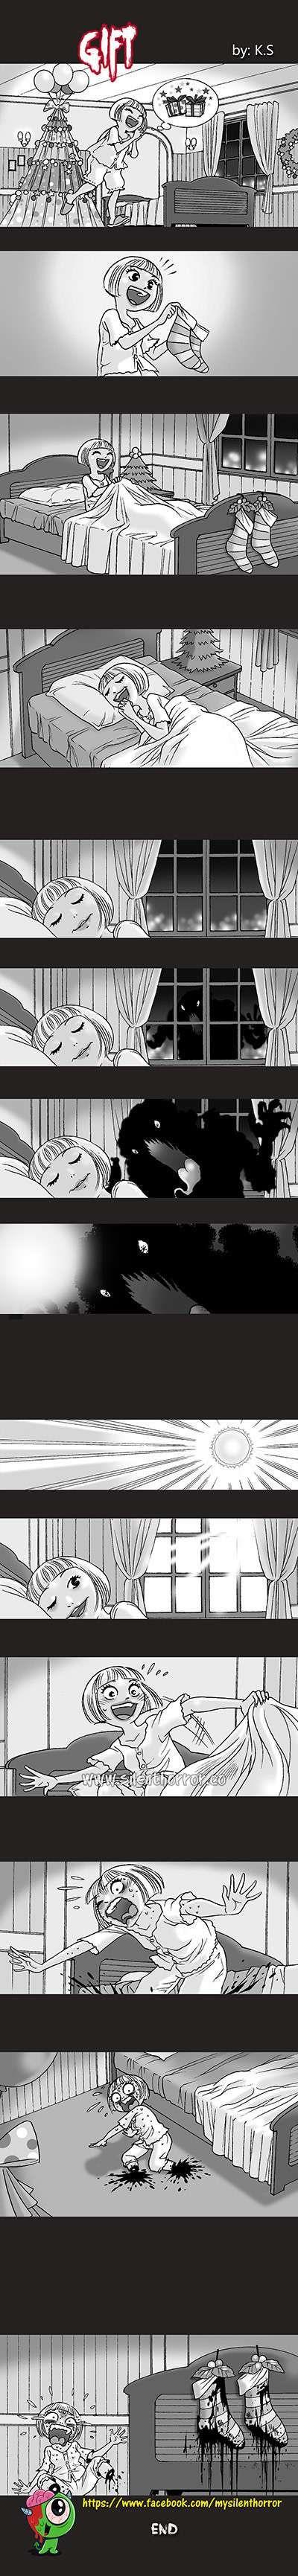 Silent Horror :: Gift | Tapastic Comics - image 1